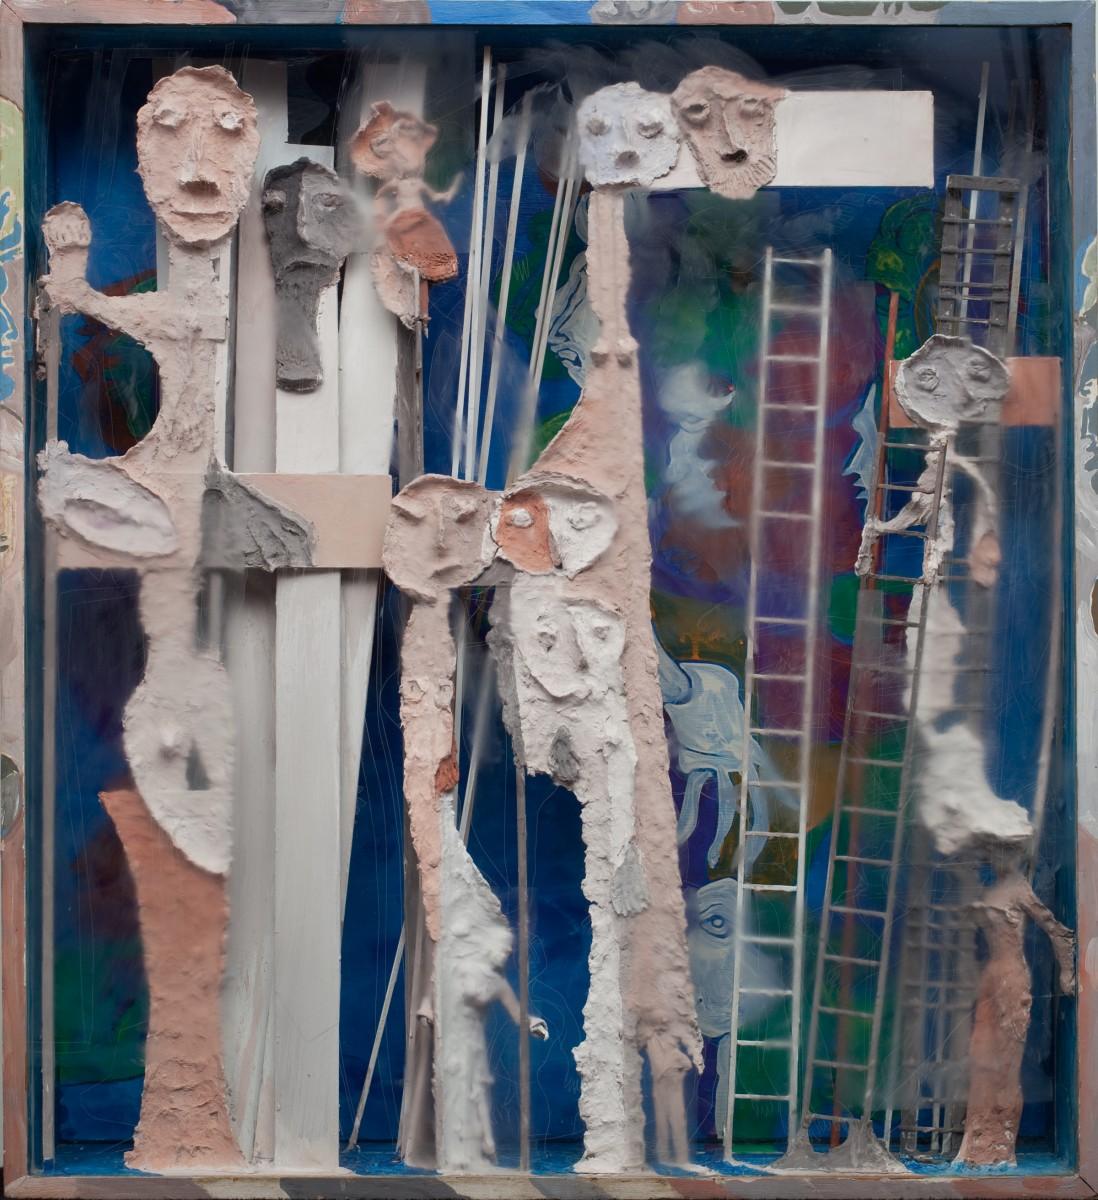 Untitled (Sculpture in a Box)